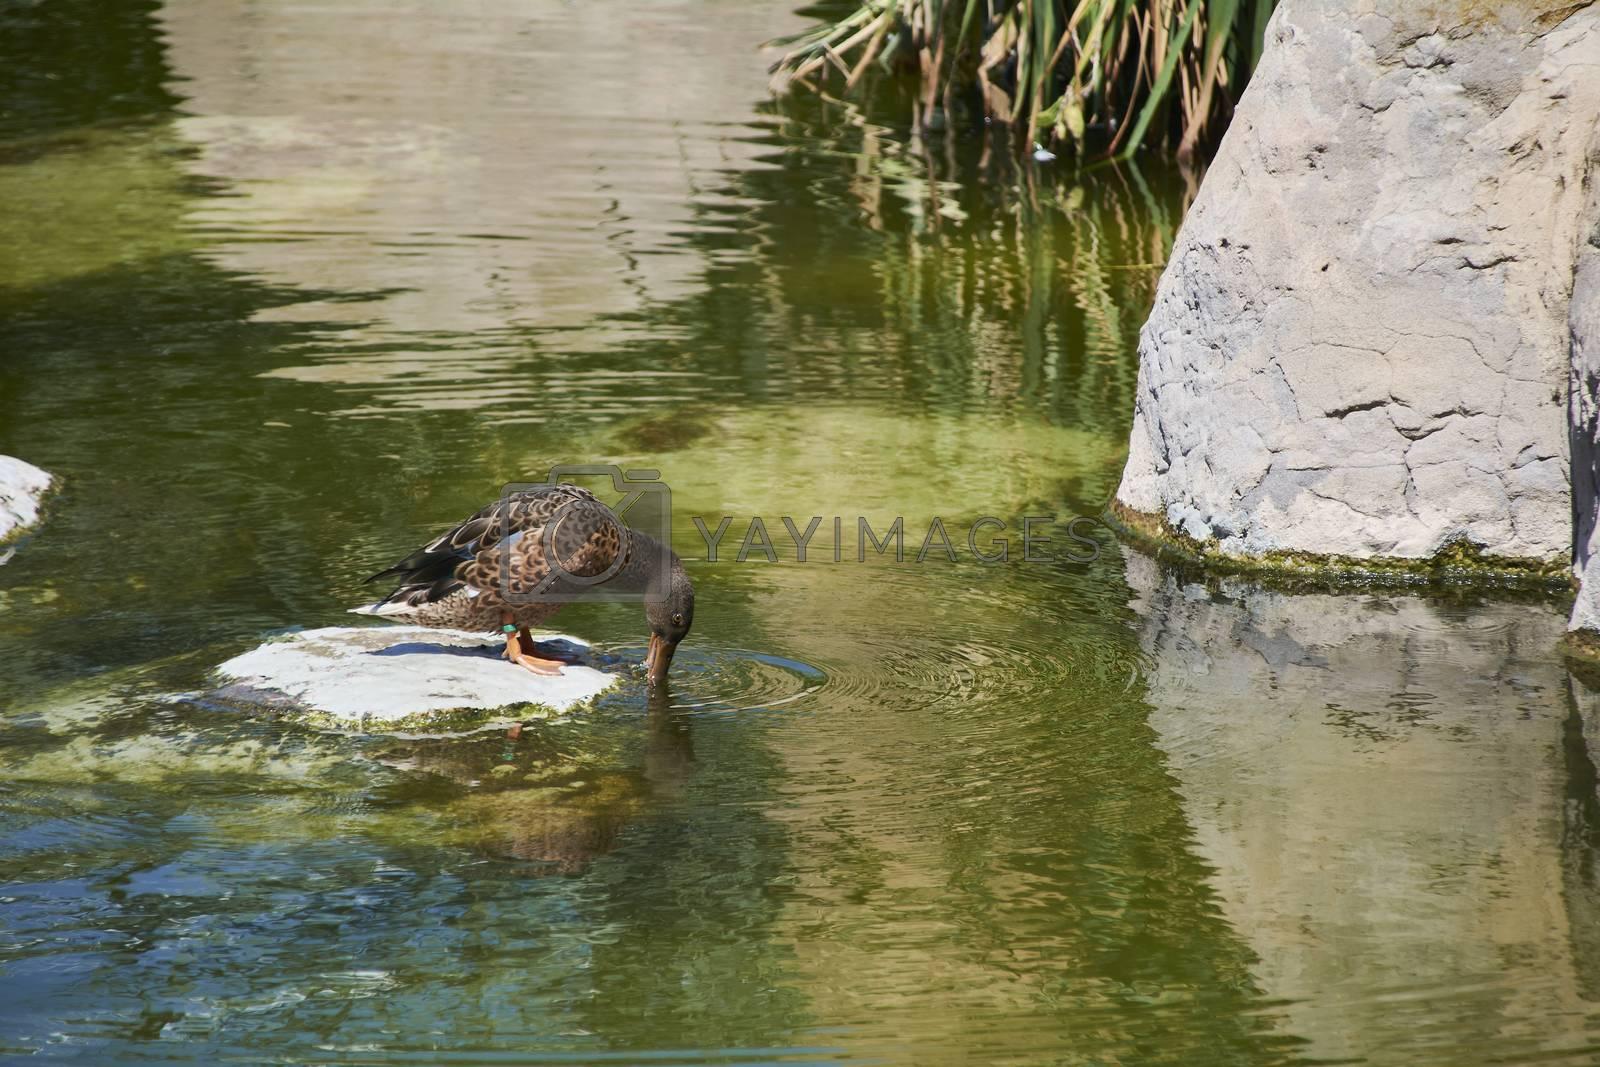 Duck on a rock drinking water, small rock, vegetation